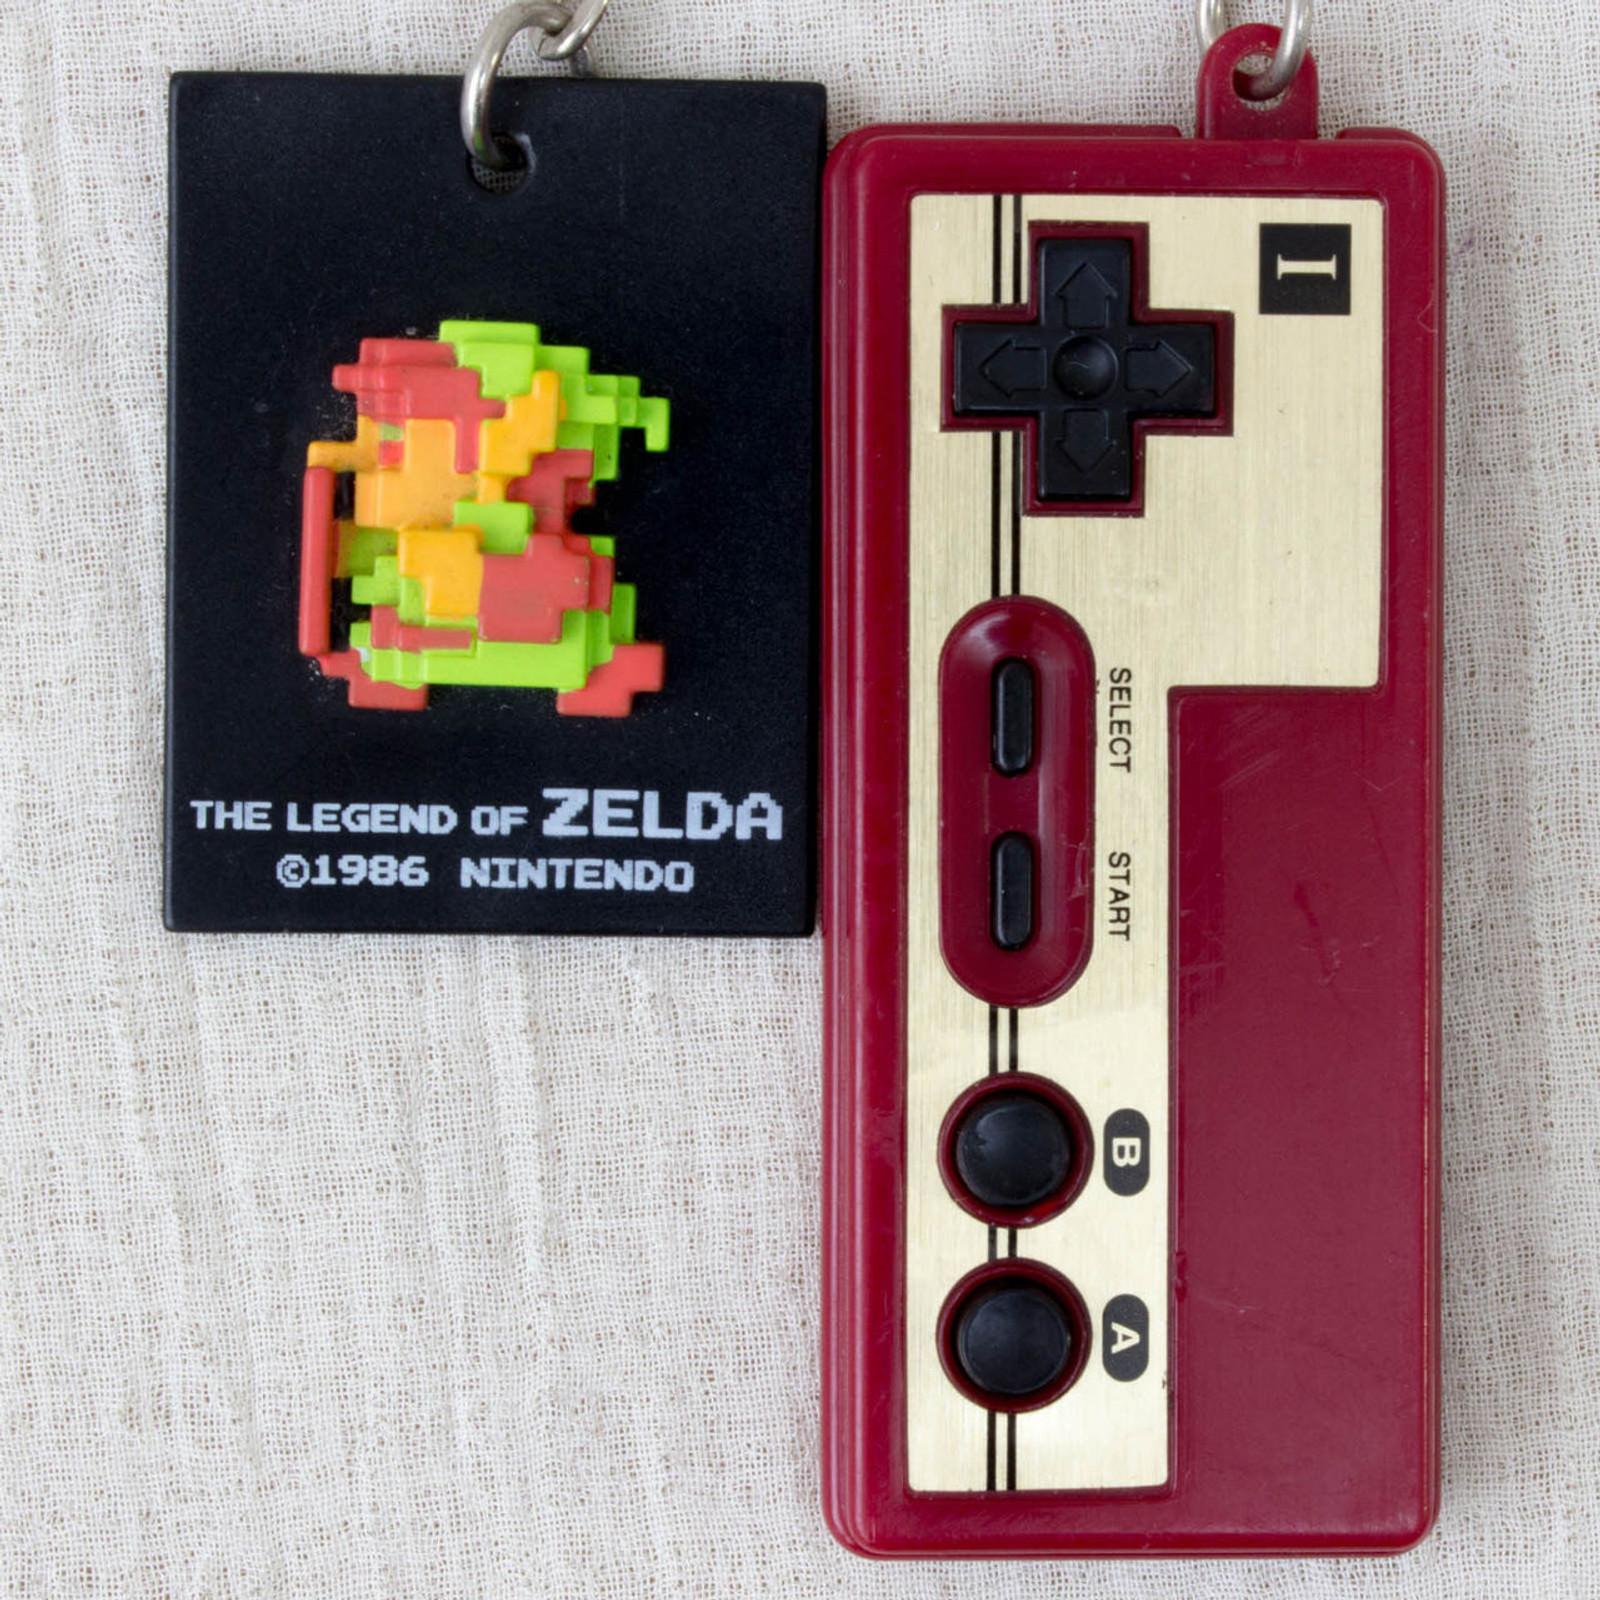 RARE! The Legend of Zelda + Famicom Controller Flute Sound Figure Keychain JAPAN